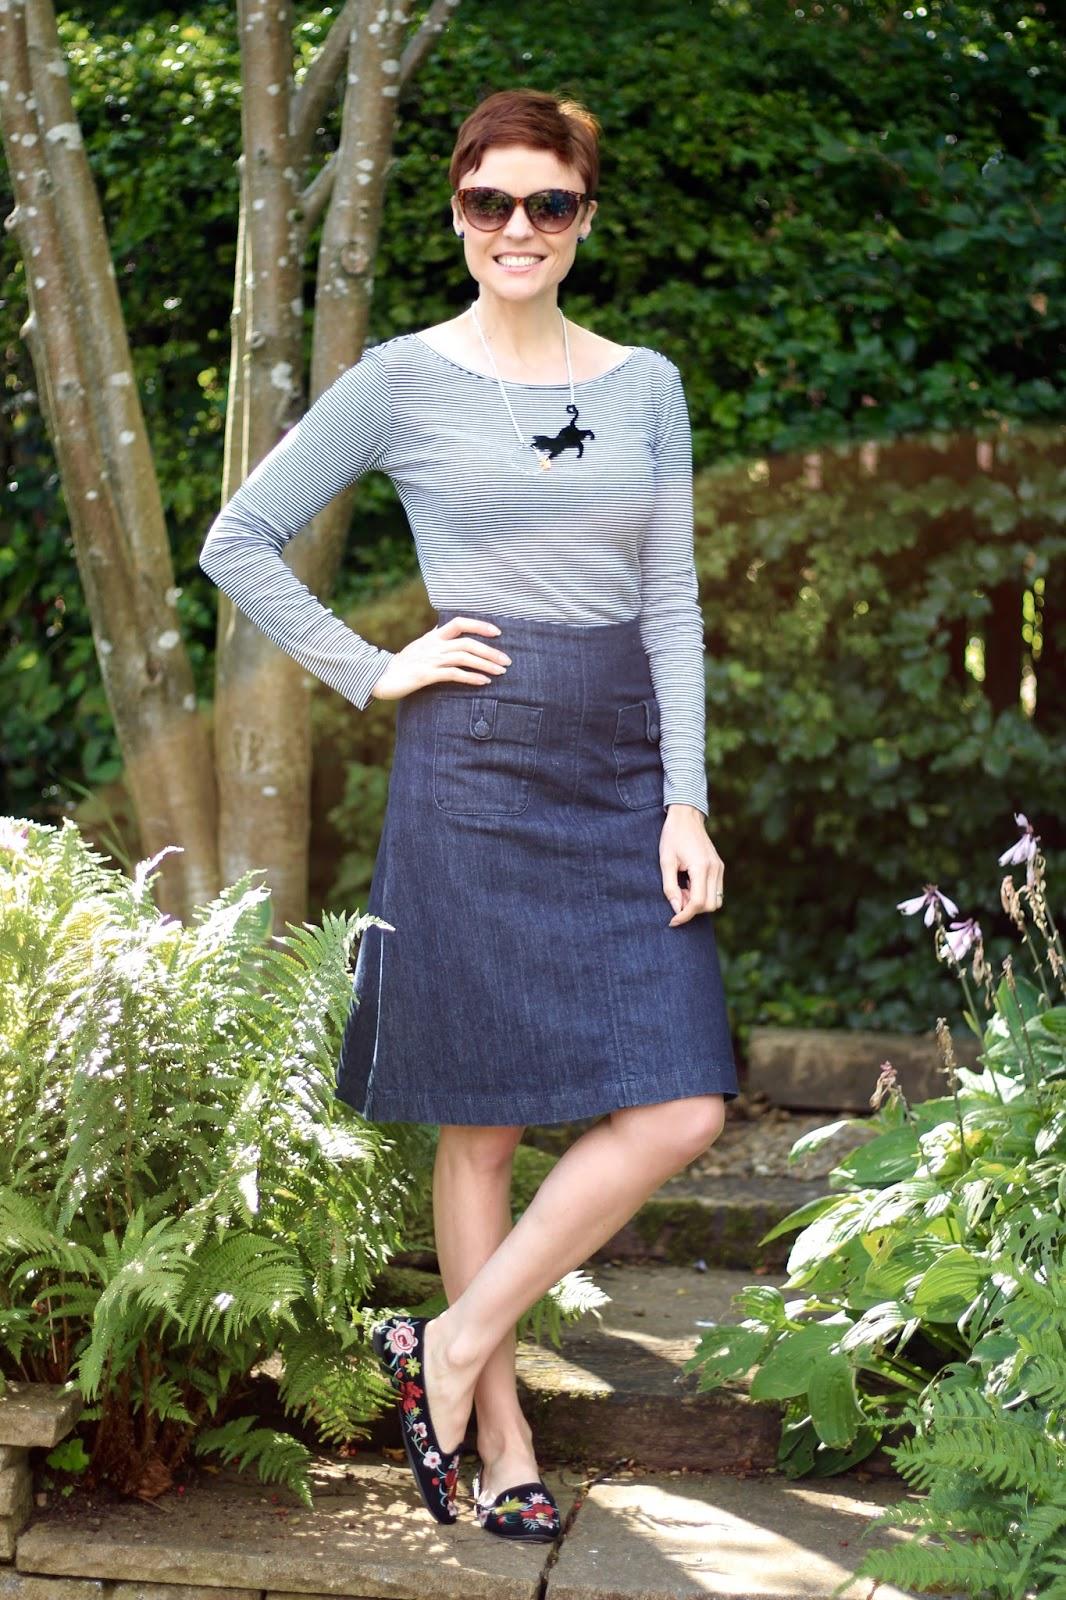 Denim A-line Skirt, embroidered shoes & Breton Stripes | Fake Fabulous